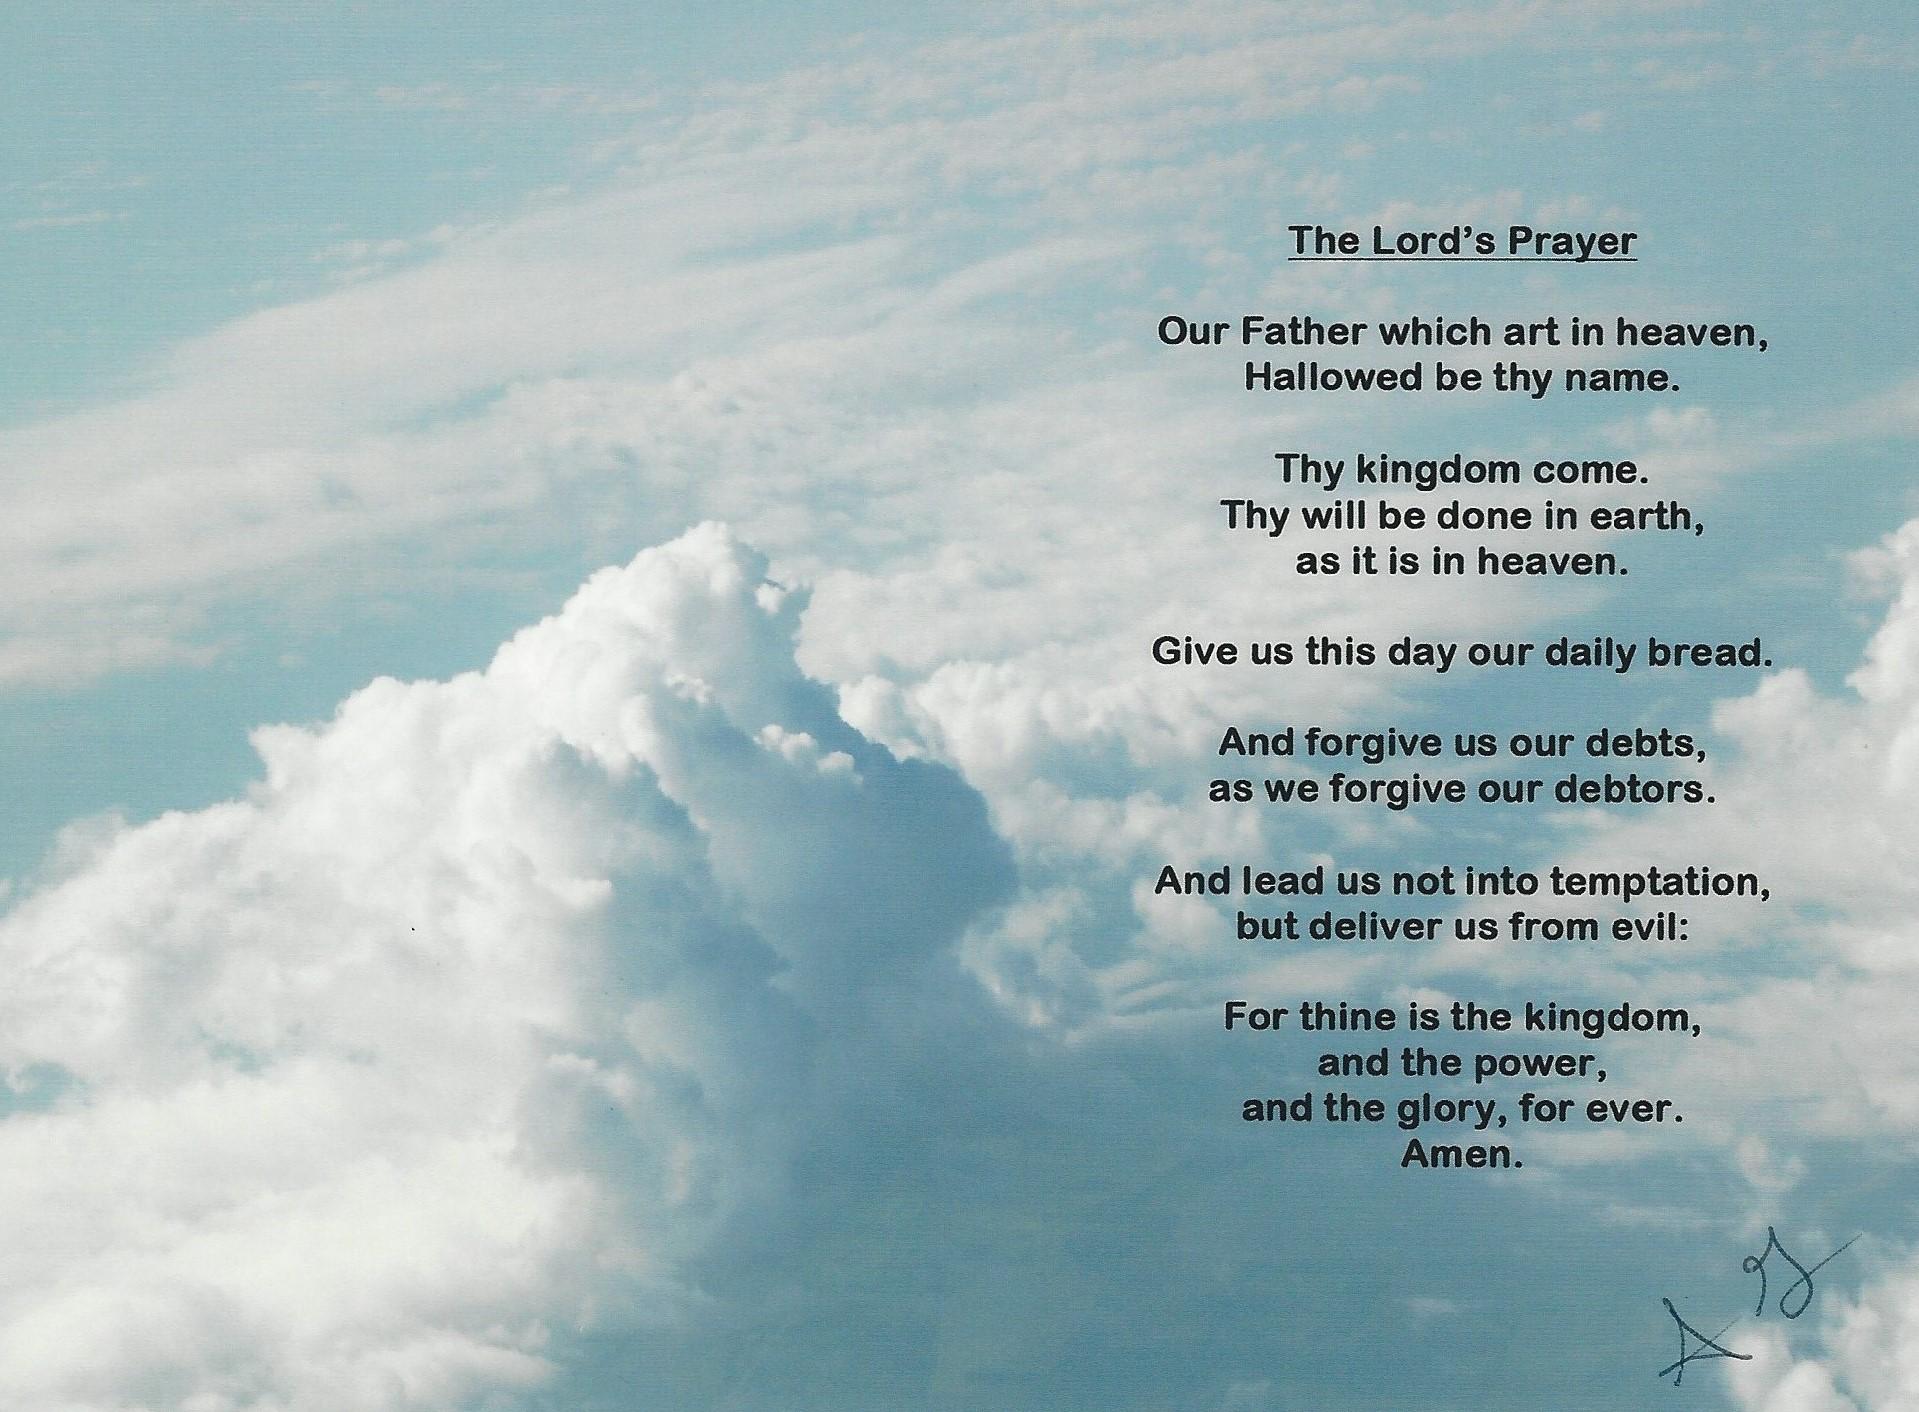 gartner - On Cloud Nine w Lords Prayer.jpg